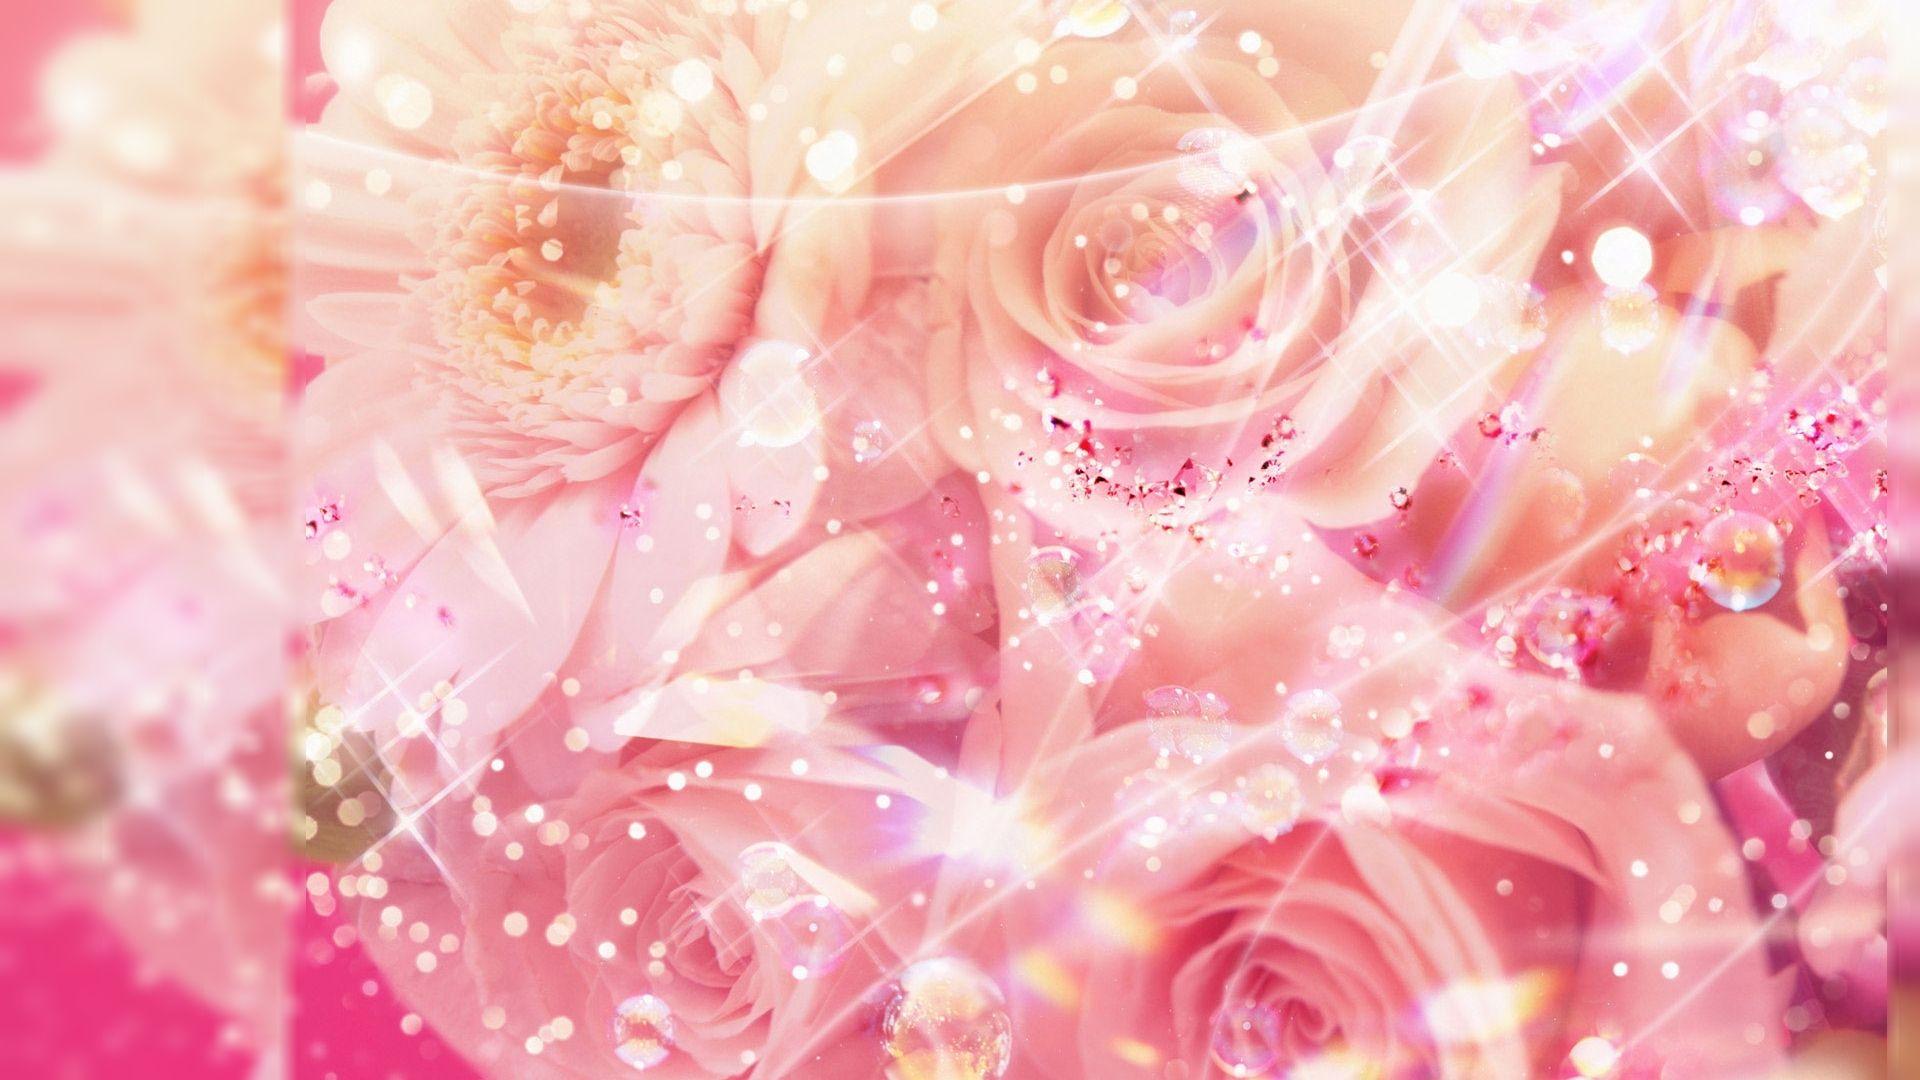 Amazing Wallpaper High Resolution Girly - 1c9ce38174458064a609a3ef8e9b0b02  Photograph_938326.jpg